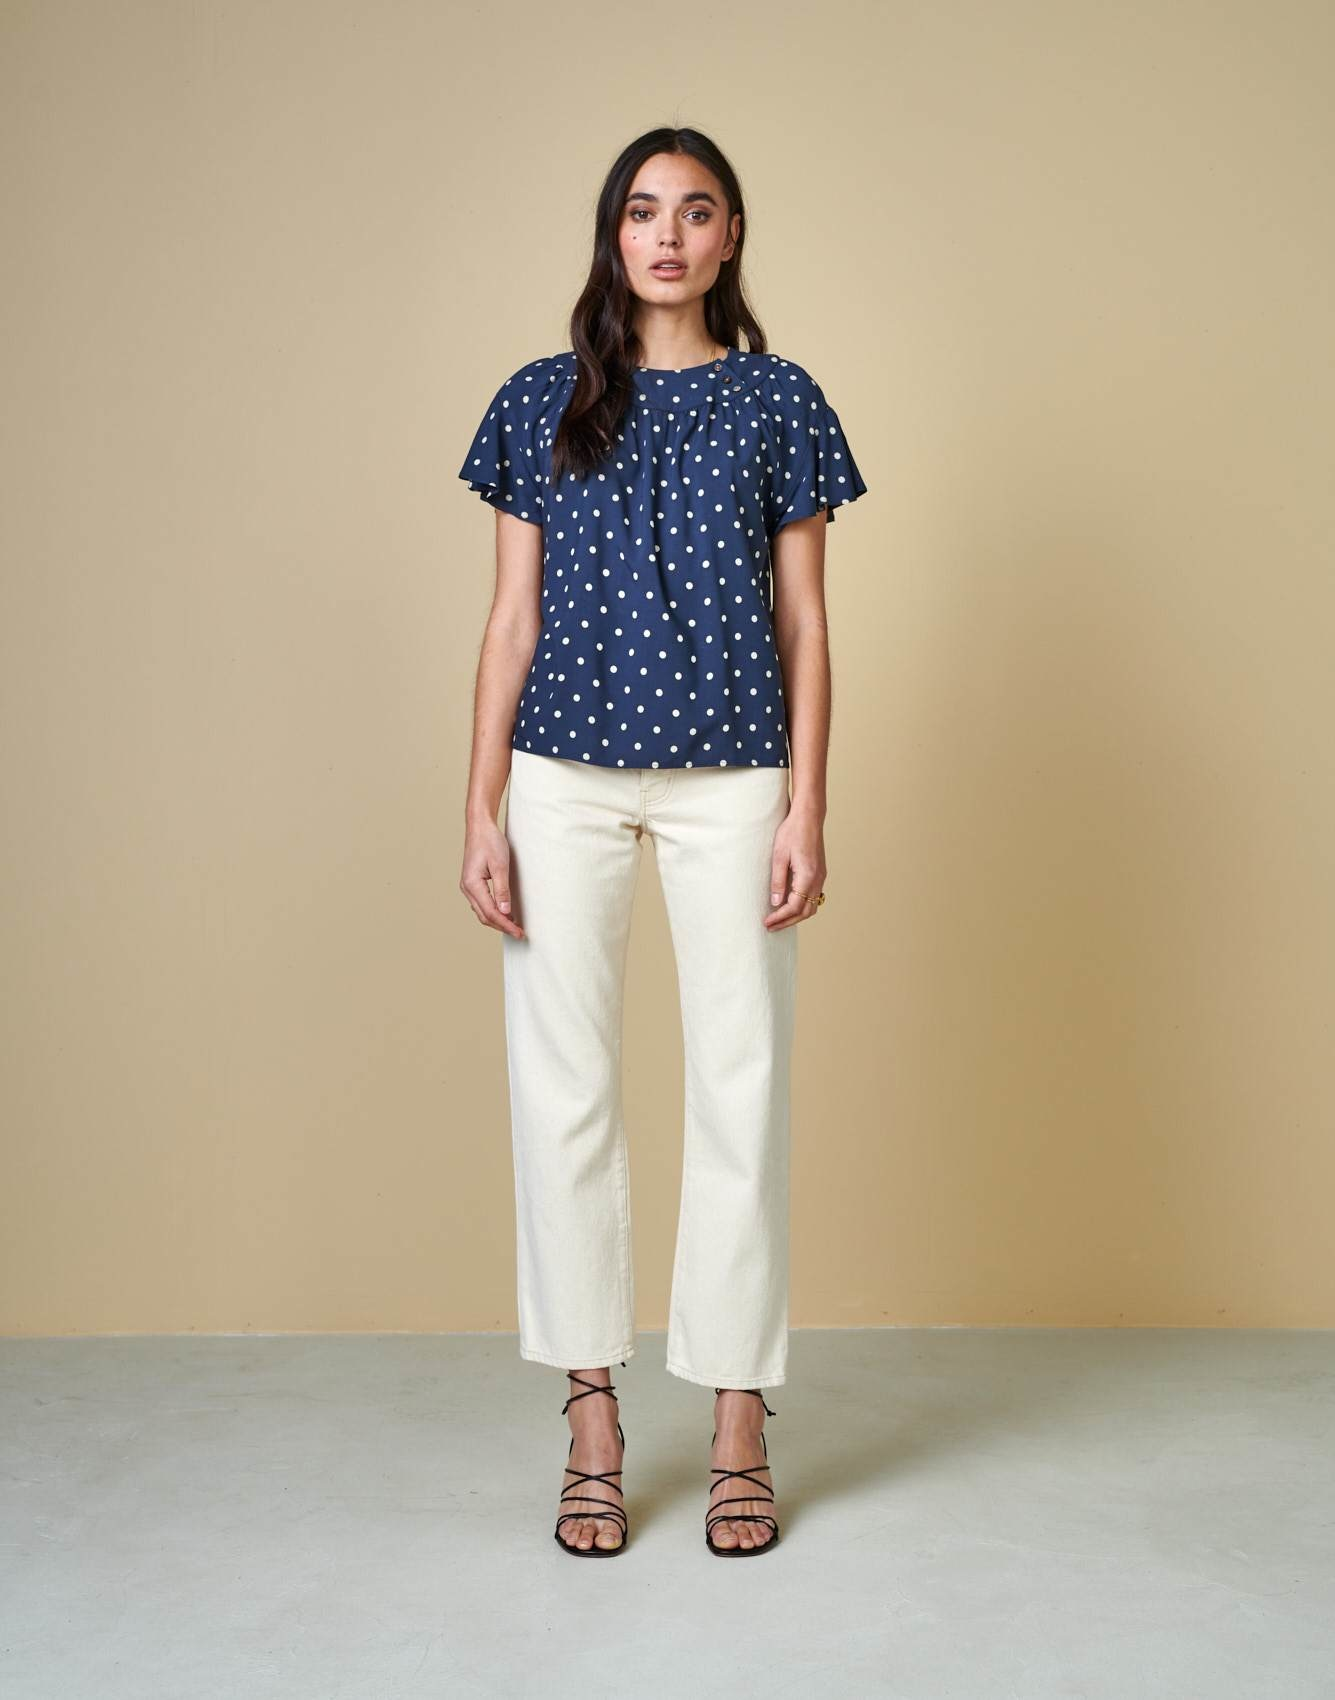 Bellerose Navy polka dot flare sleeve blouse - Amoke Top